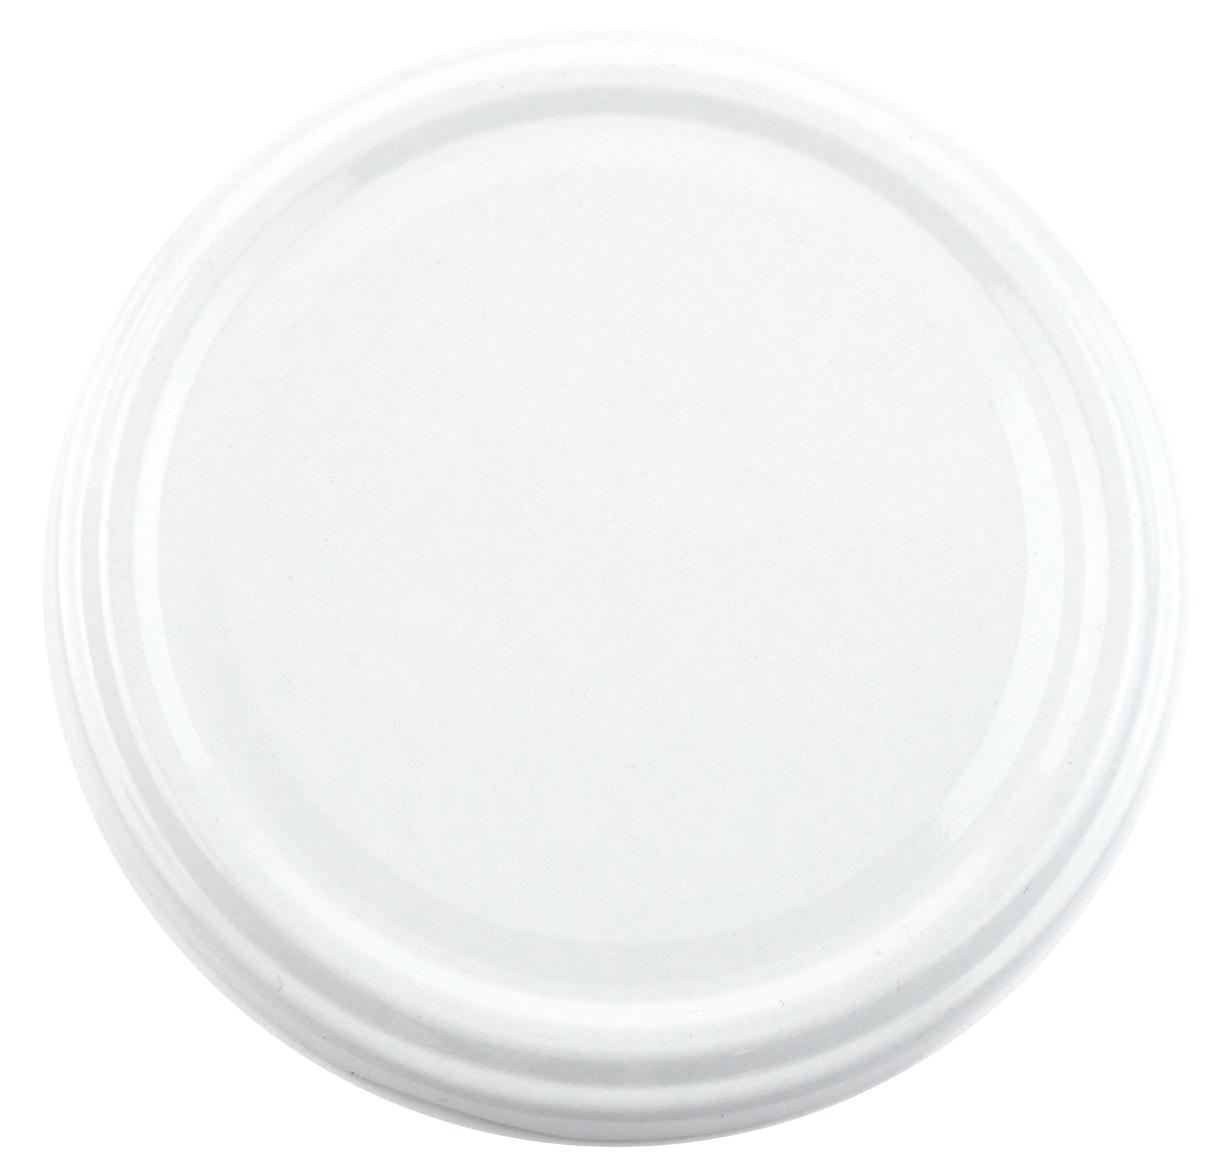 Honigglasdeckel Weiss 82 mm